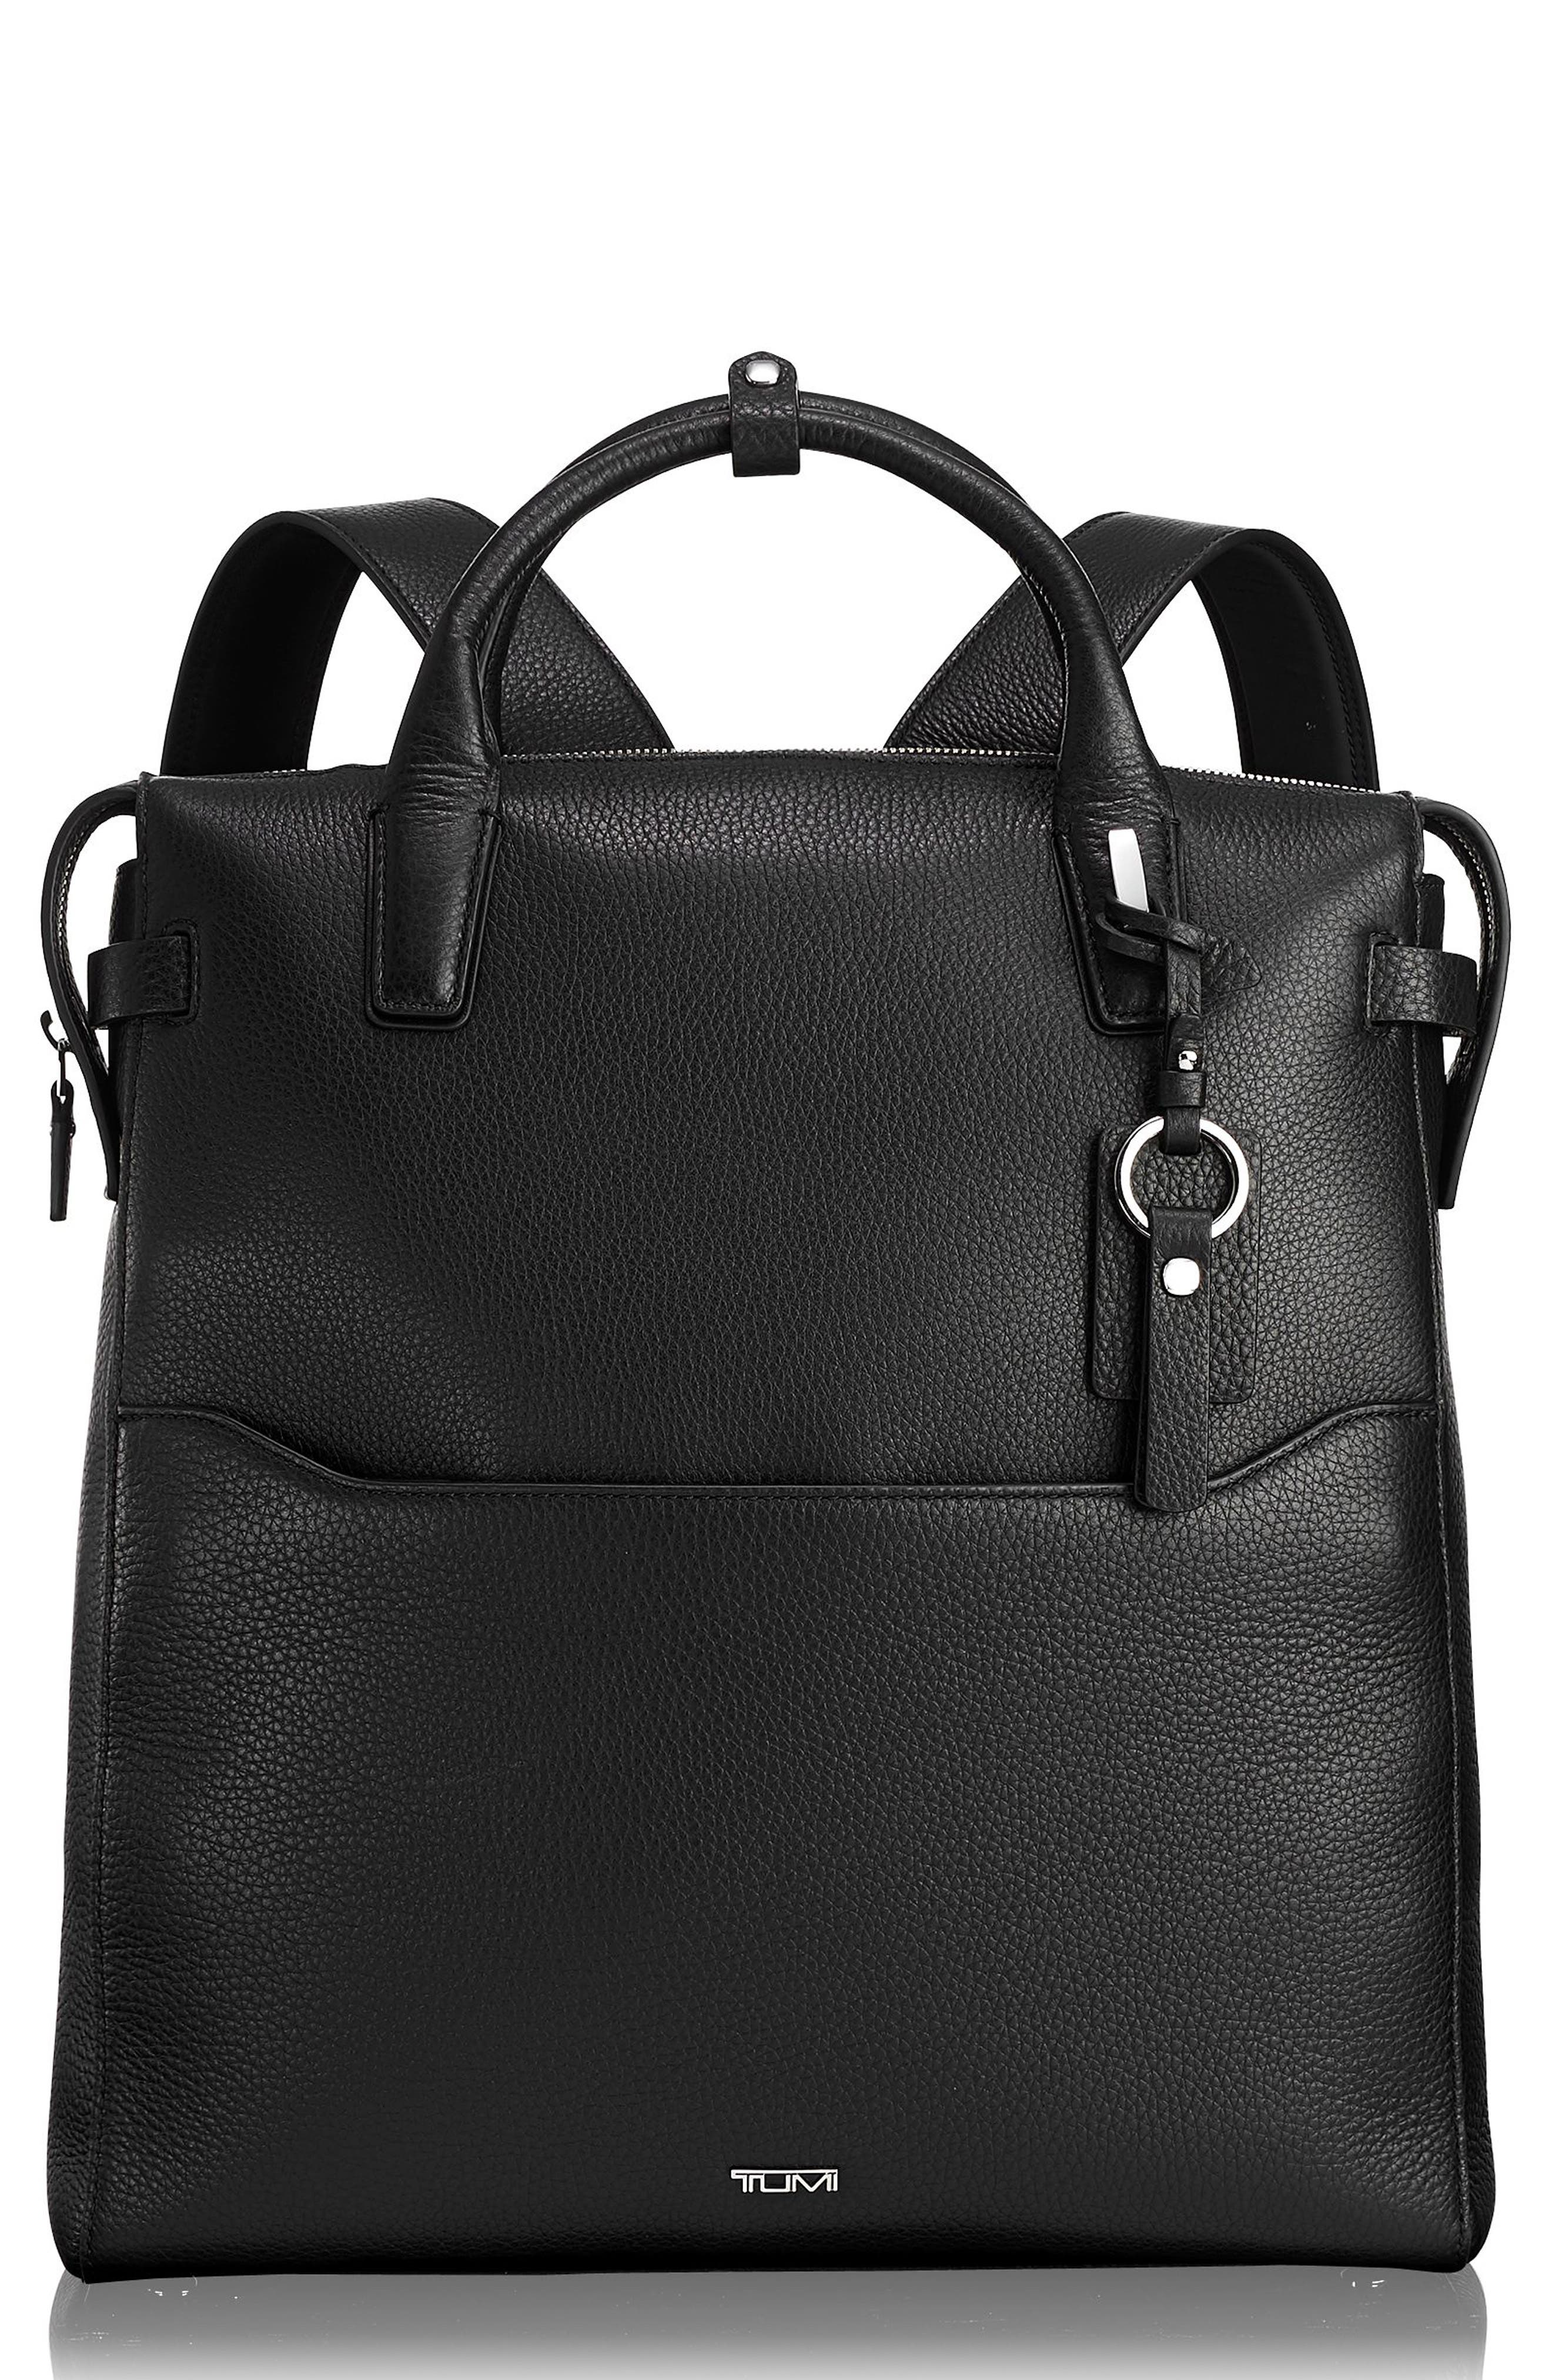 Stanton Stanton Safra Convertible Laptop Backpack/Tote,                         Main,                         color, BLACK